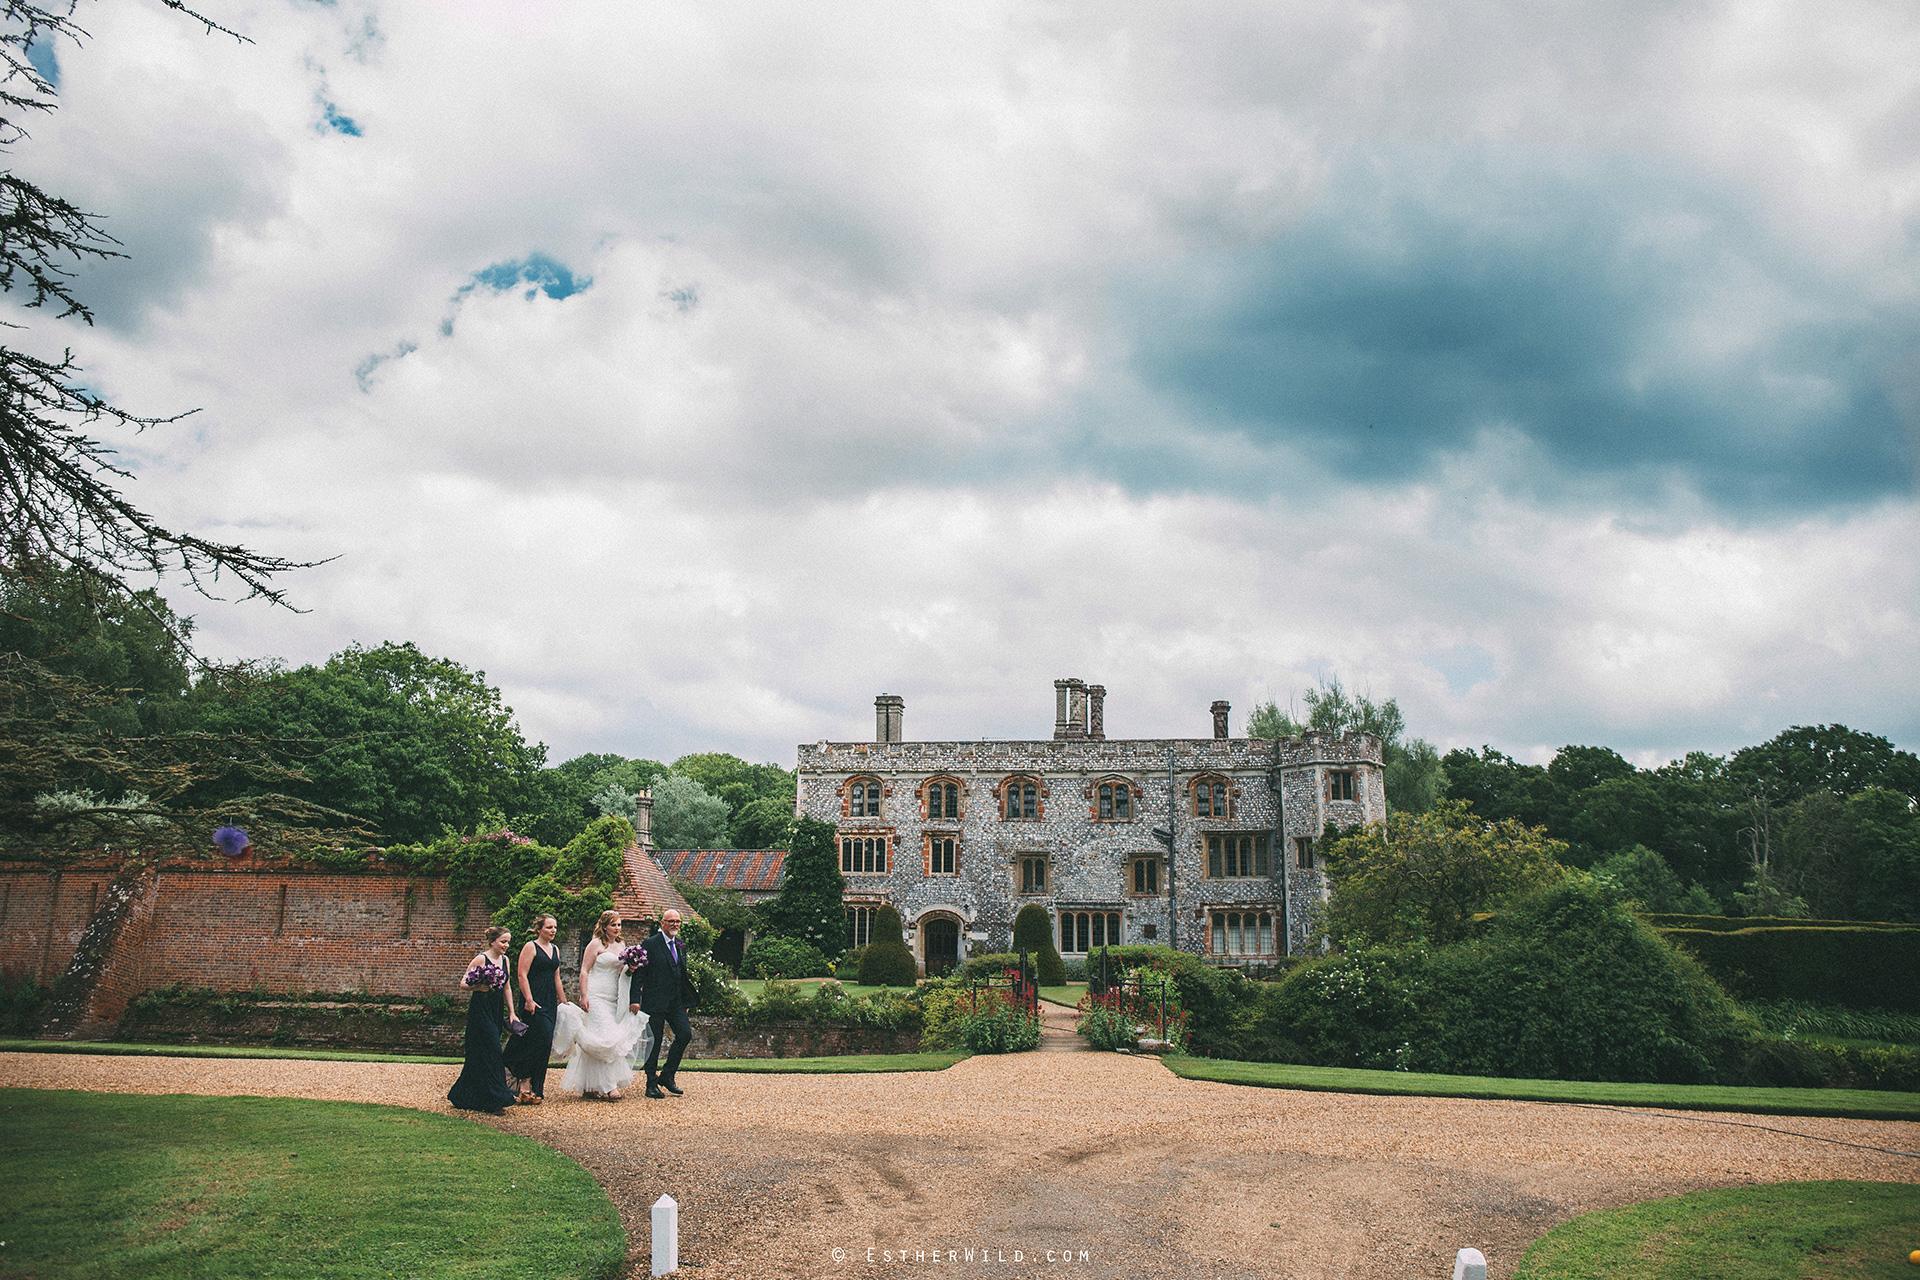 0617_Mannington_Hall_Gardens_Wedding_Photography_Esther_Wild_IMG_0889.jpg